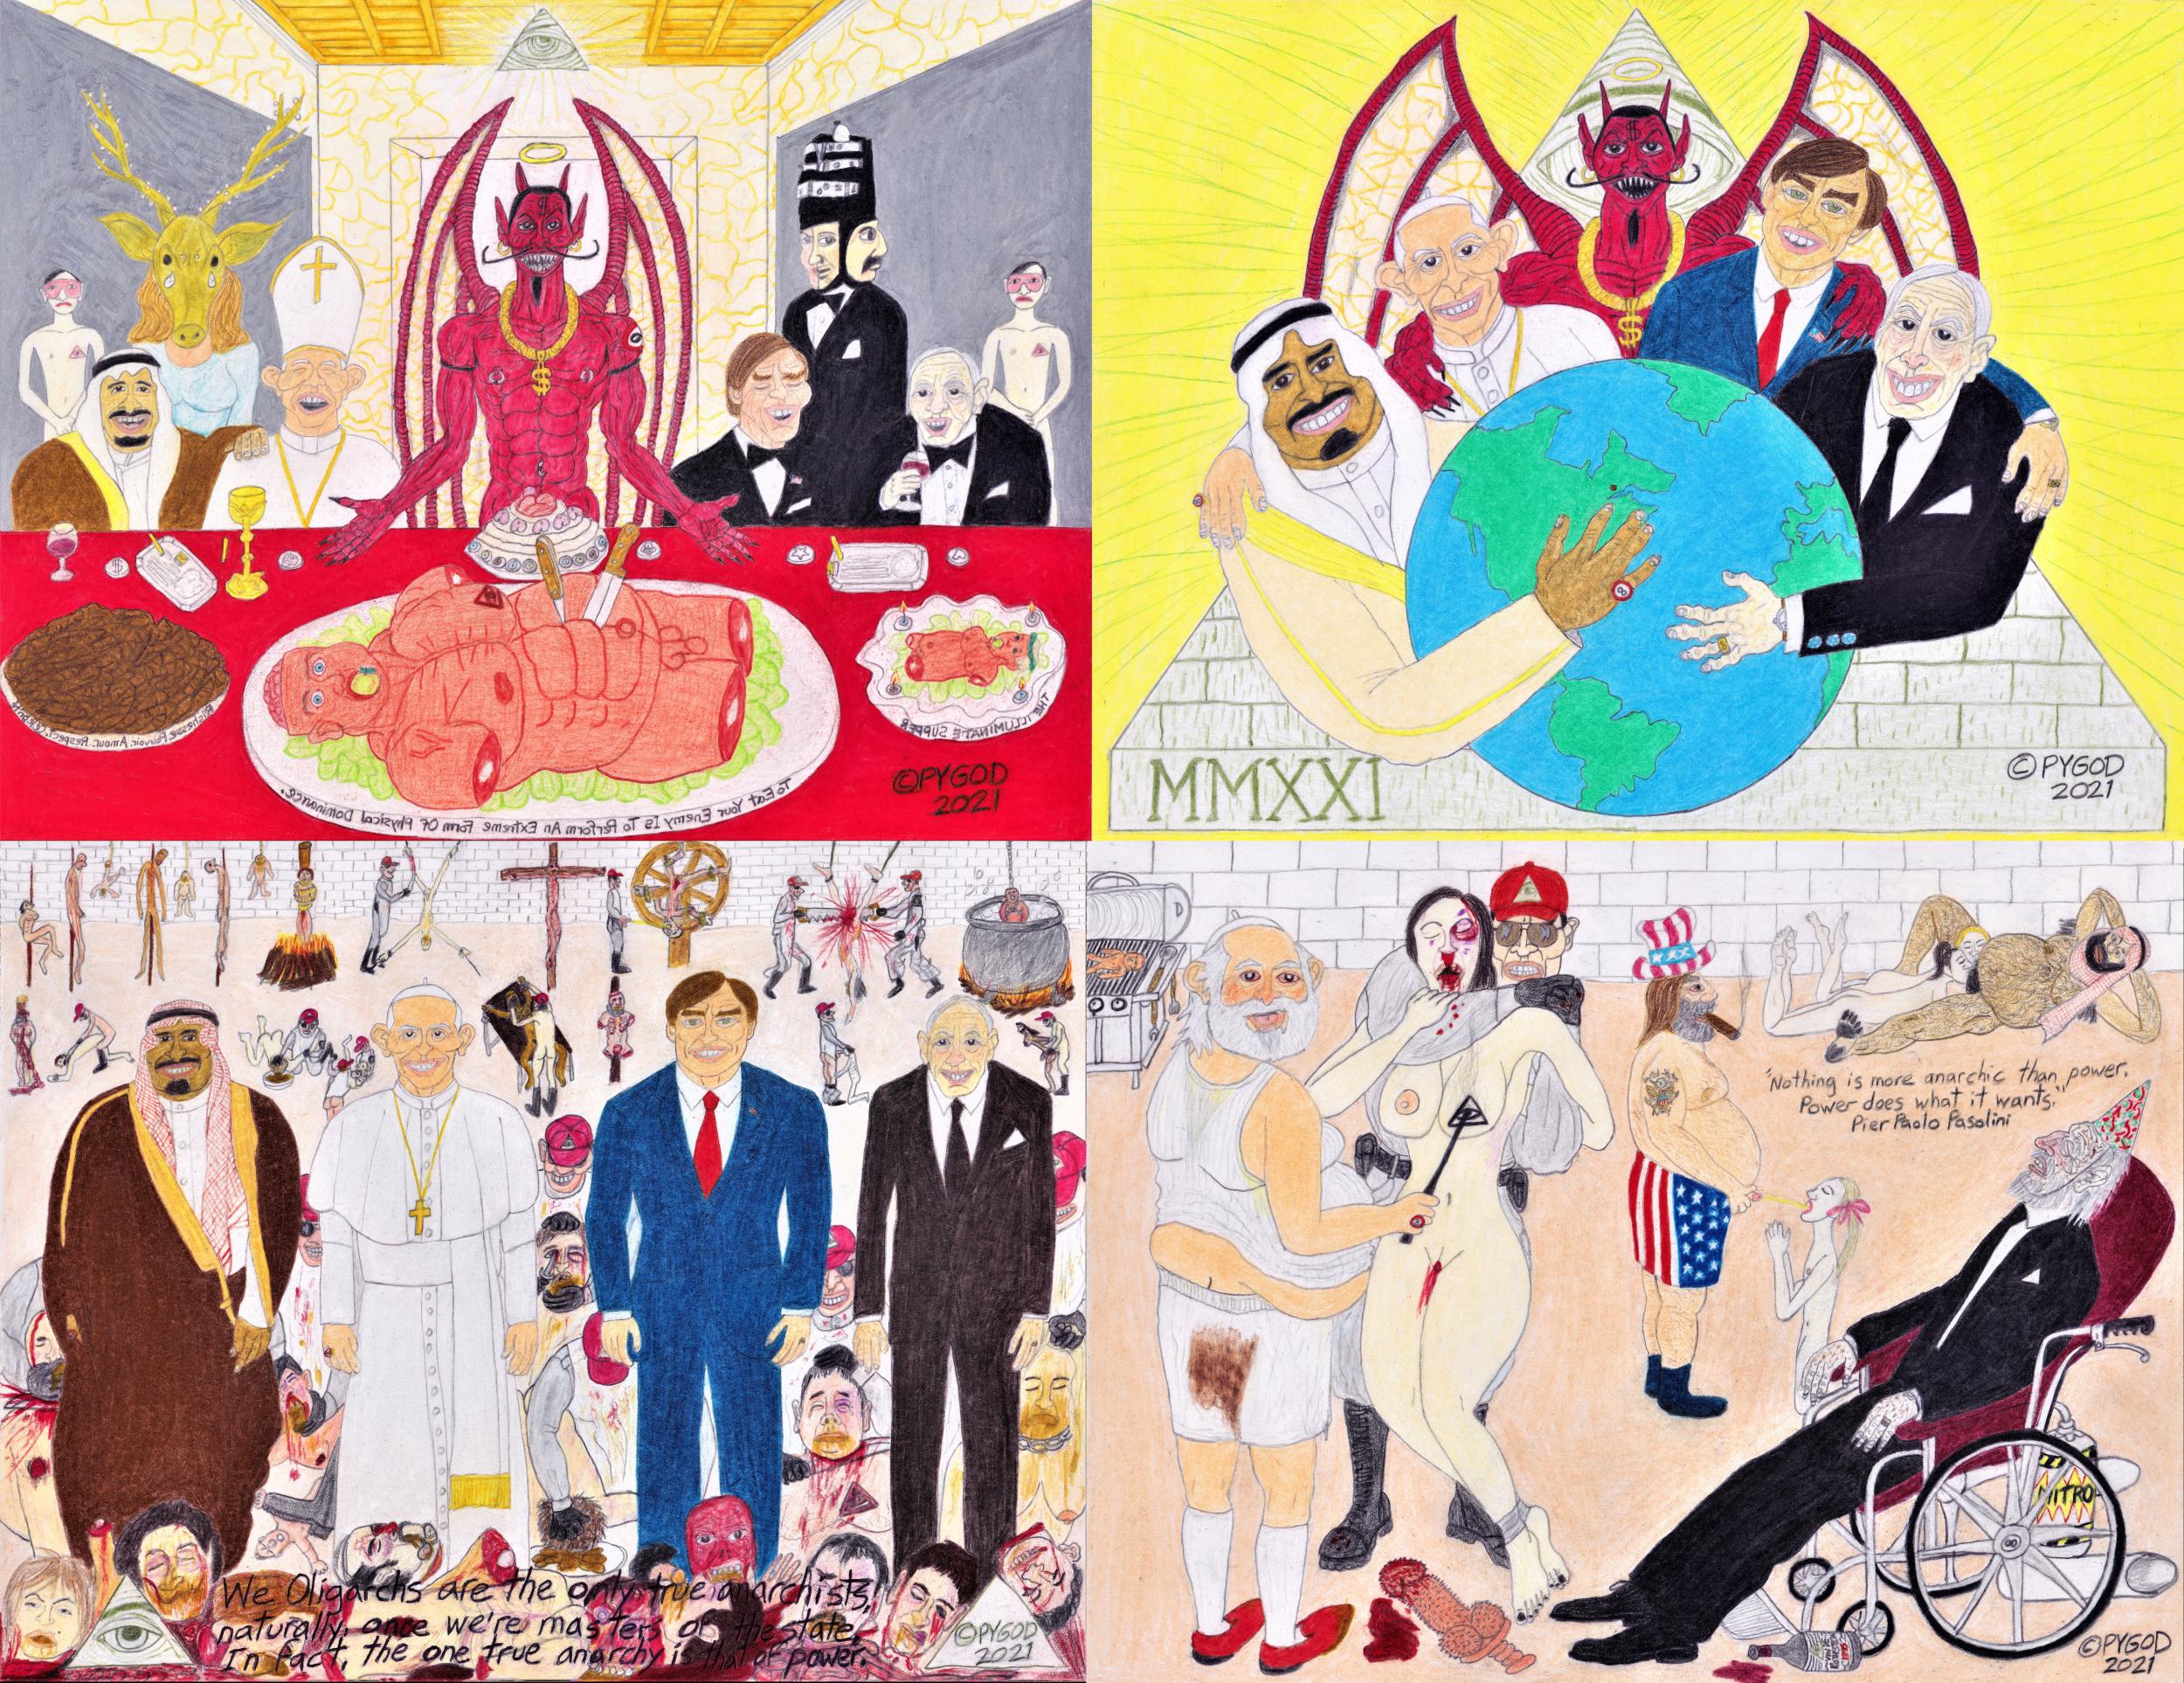 The Four Oligarchs (Illuminati) Saga. SatansSchlongs.com